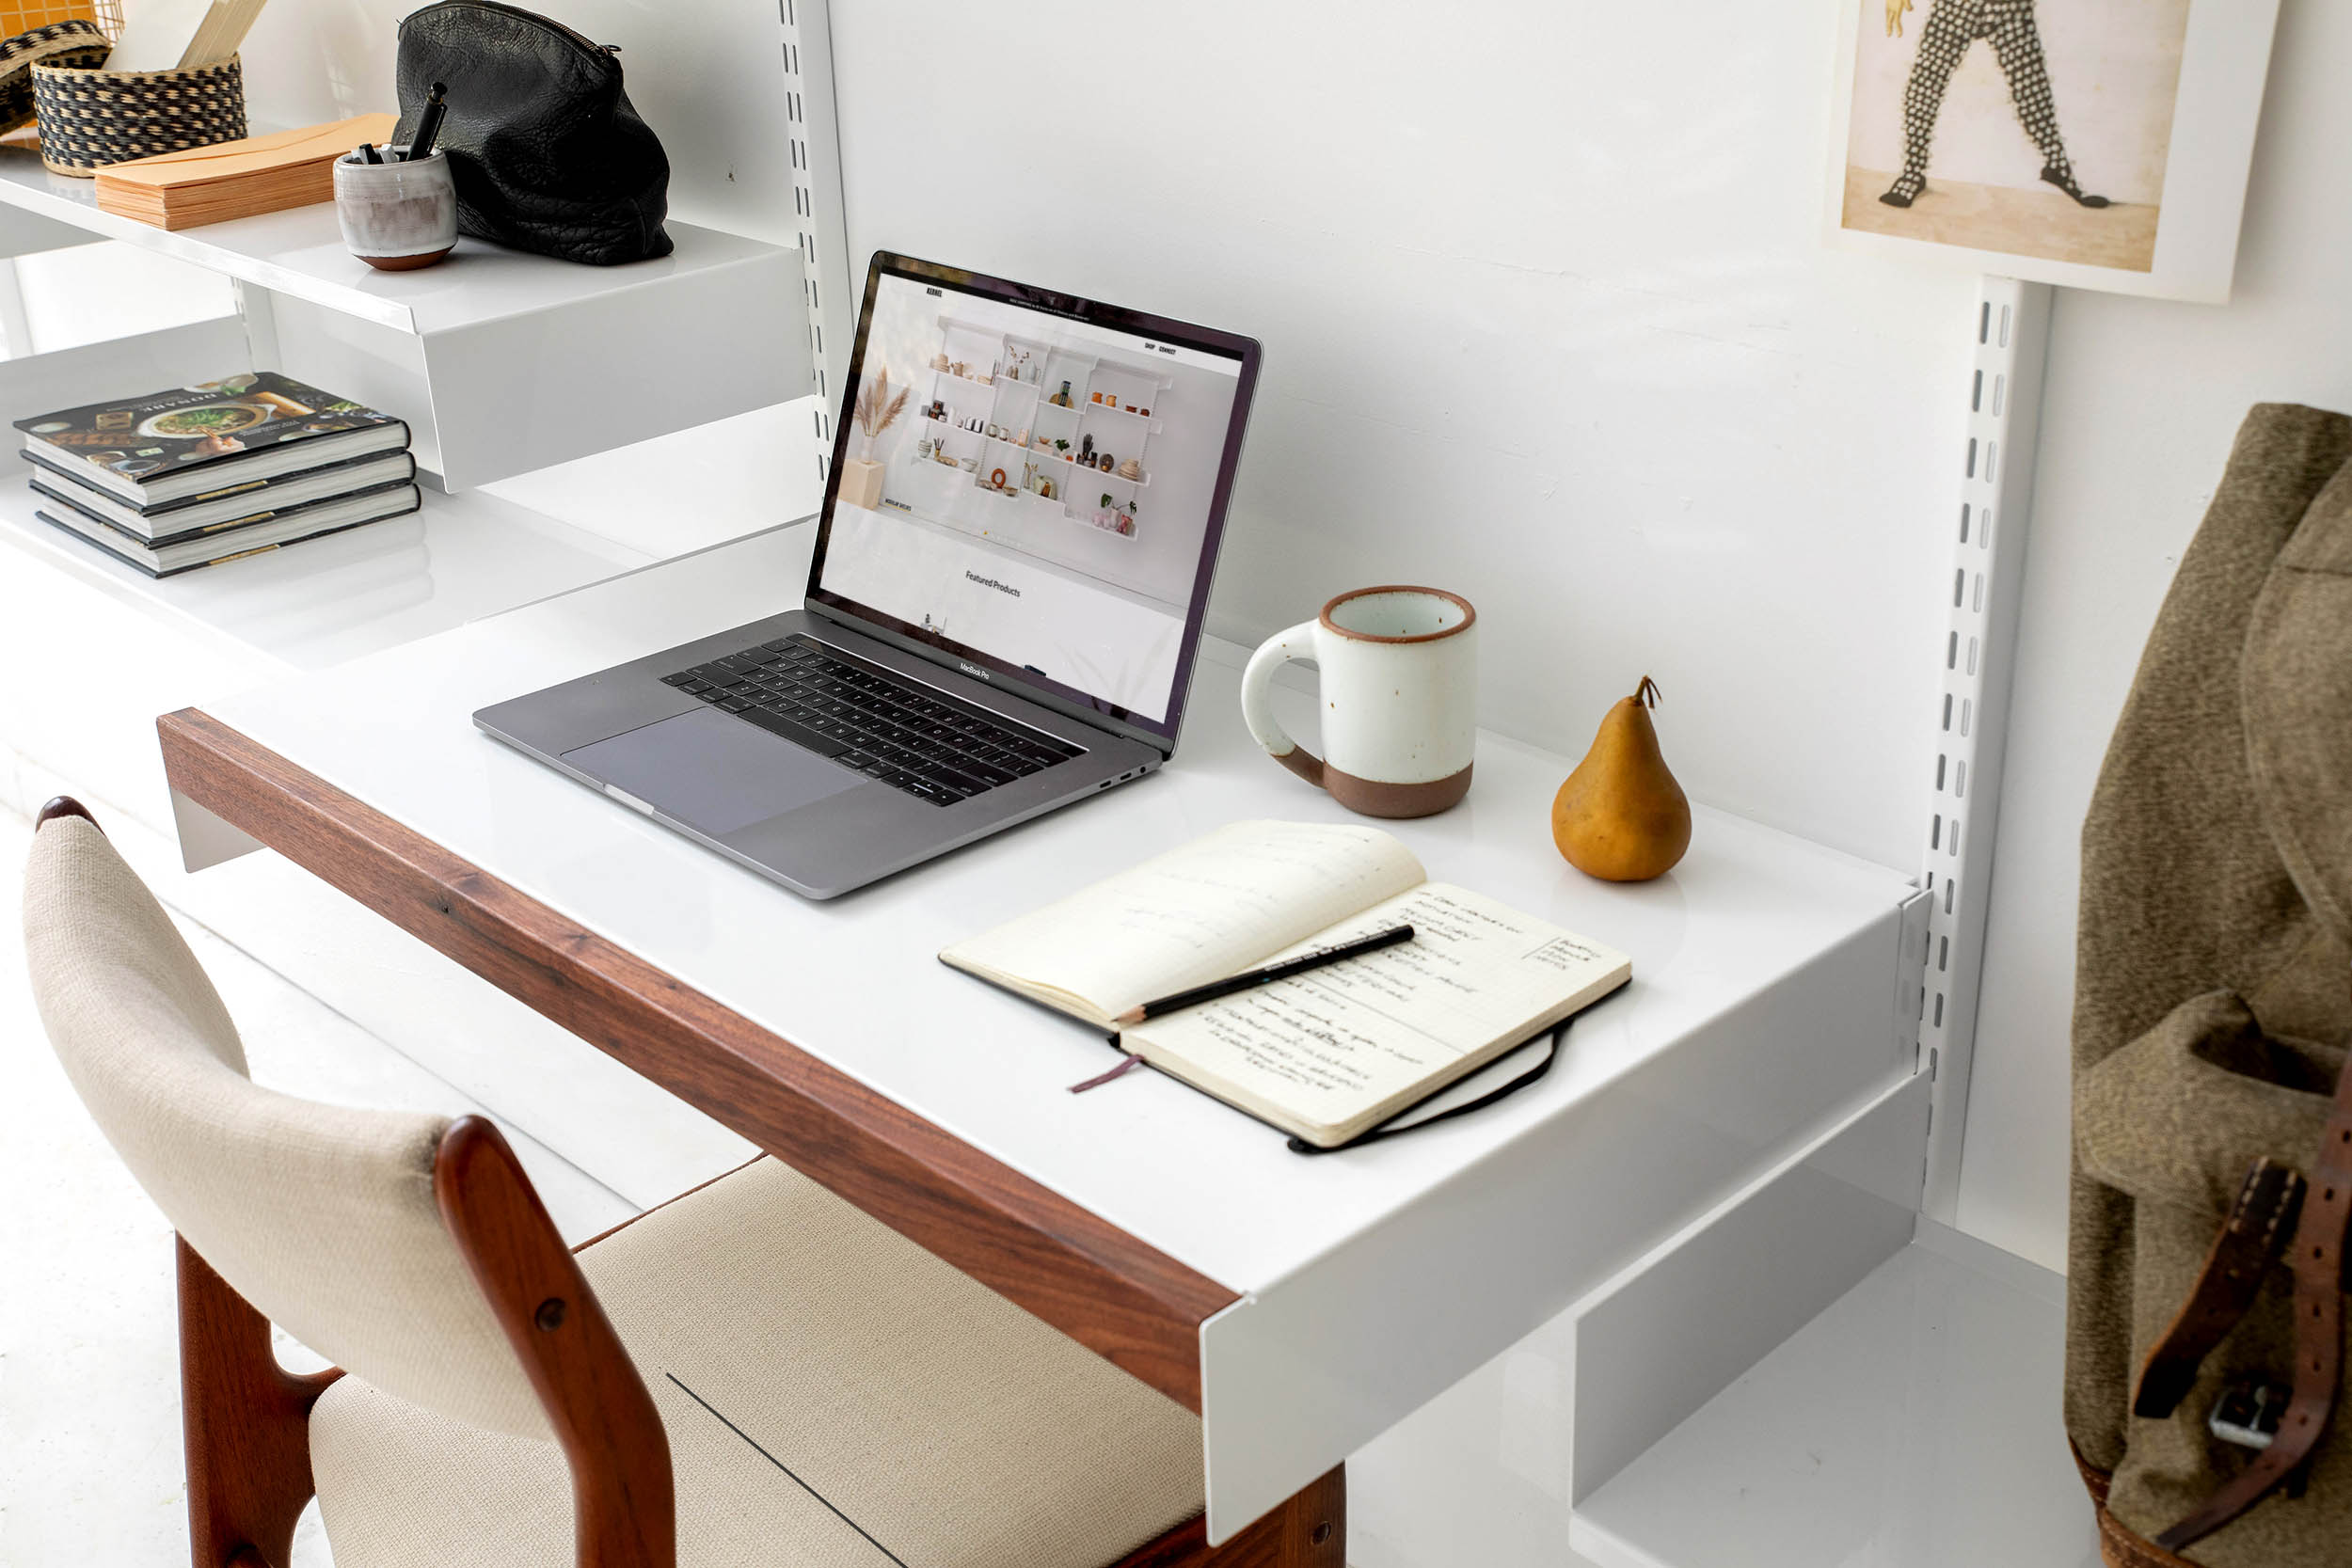 Adjustable Desk in industrial Loft